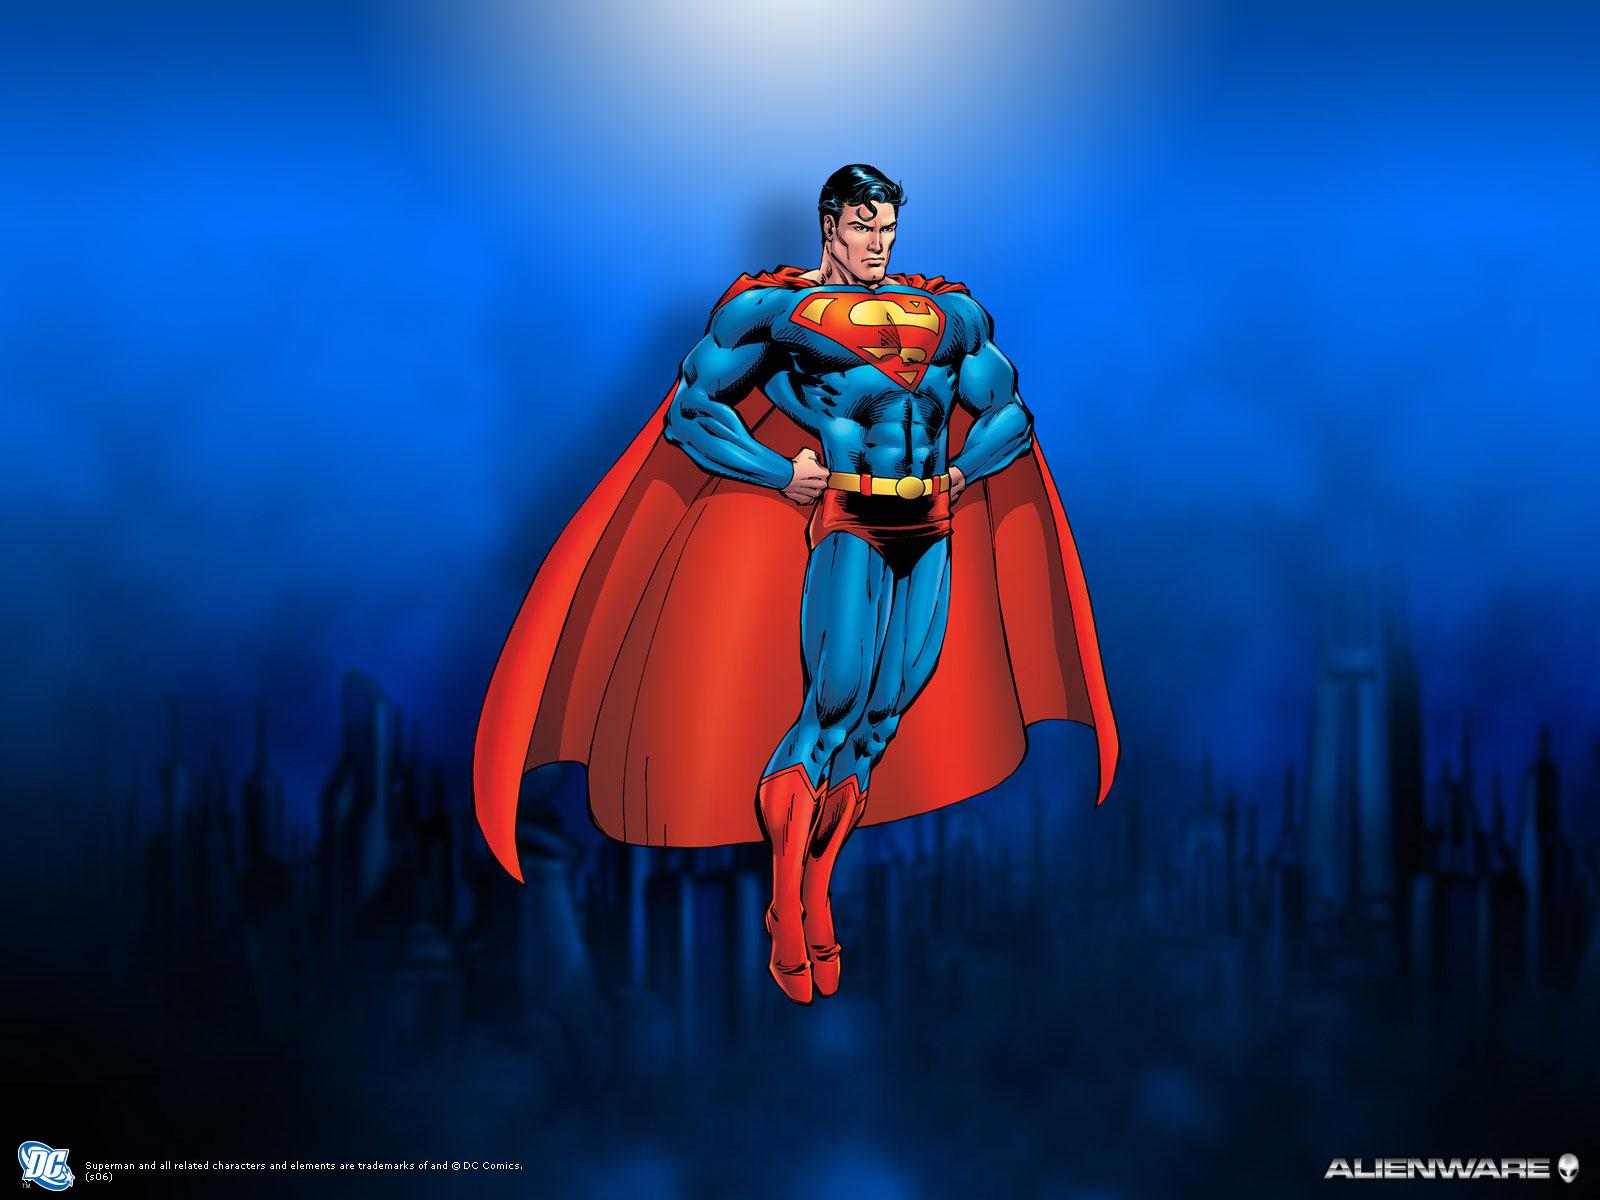 superhero wallpaper 1600x1200